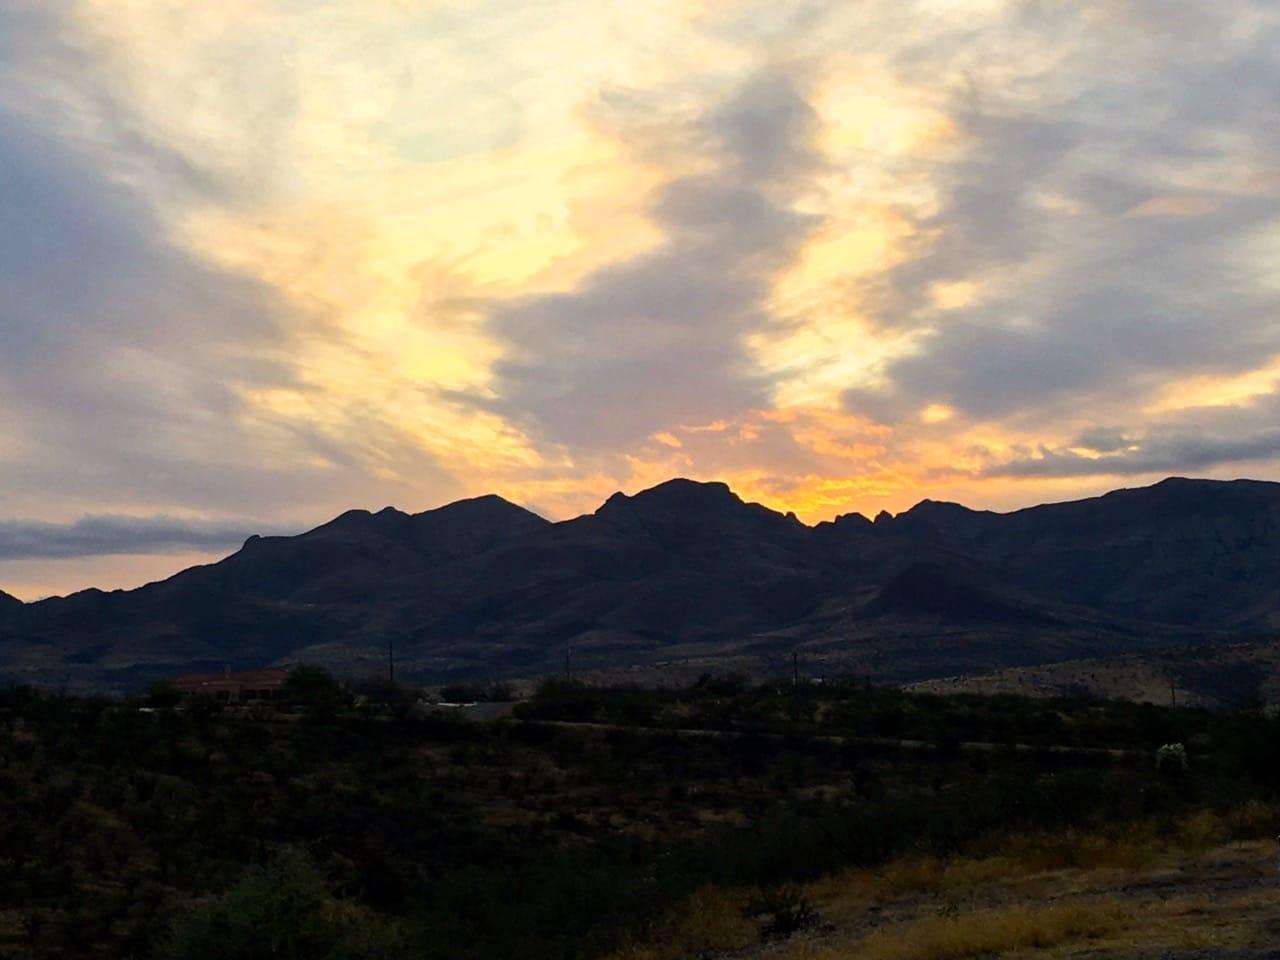 Sunset from Rio Rico, Arizona